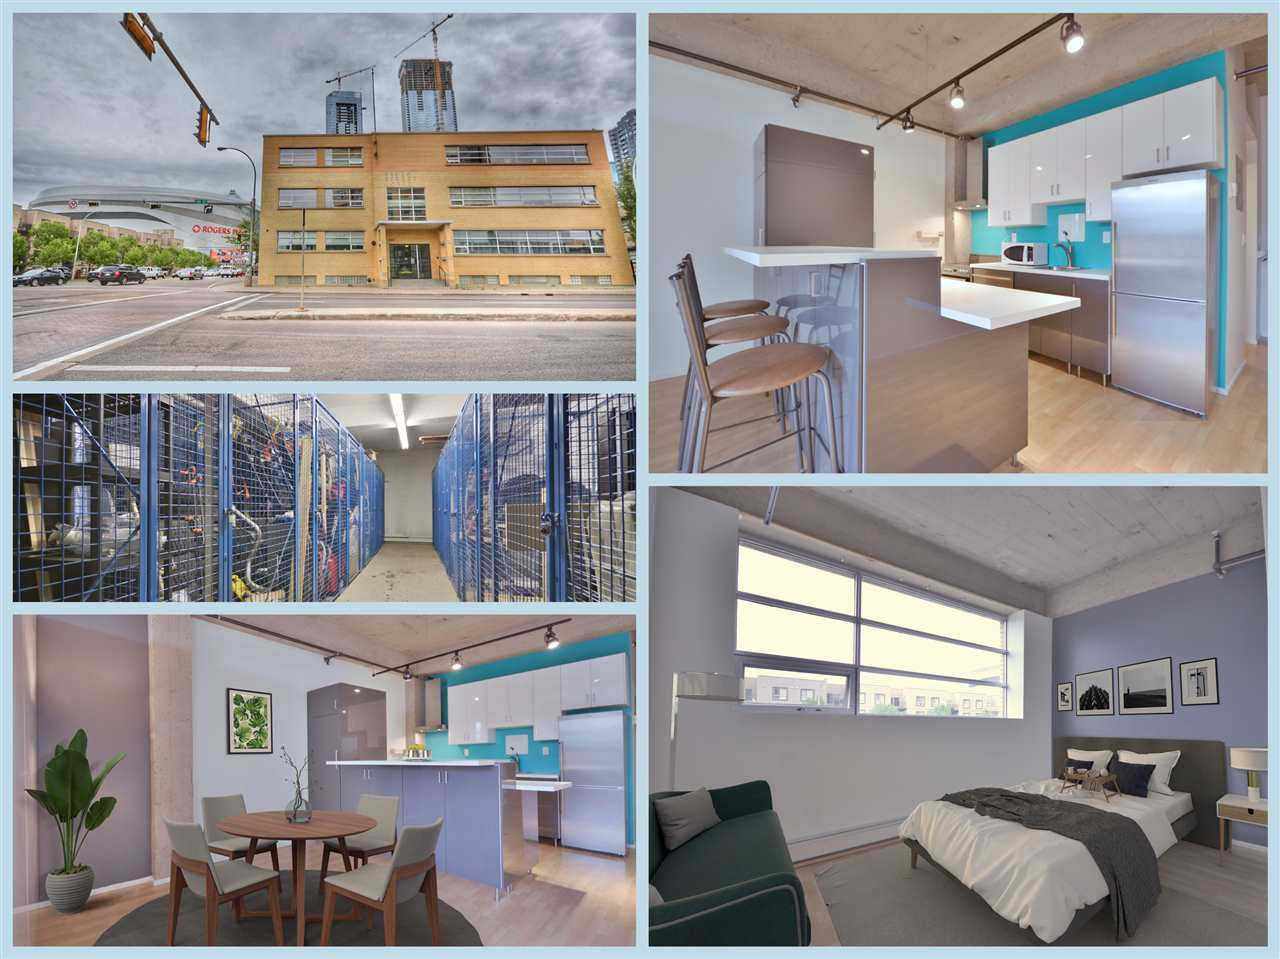 206 10355 105 Street, 1 bed, 1 bath, at $246,000